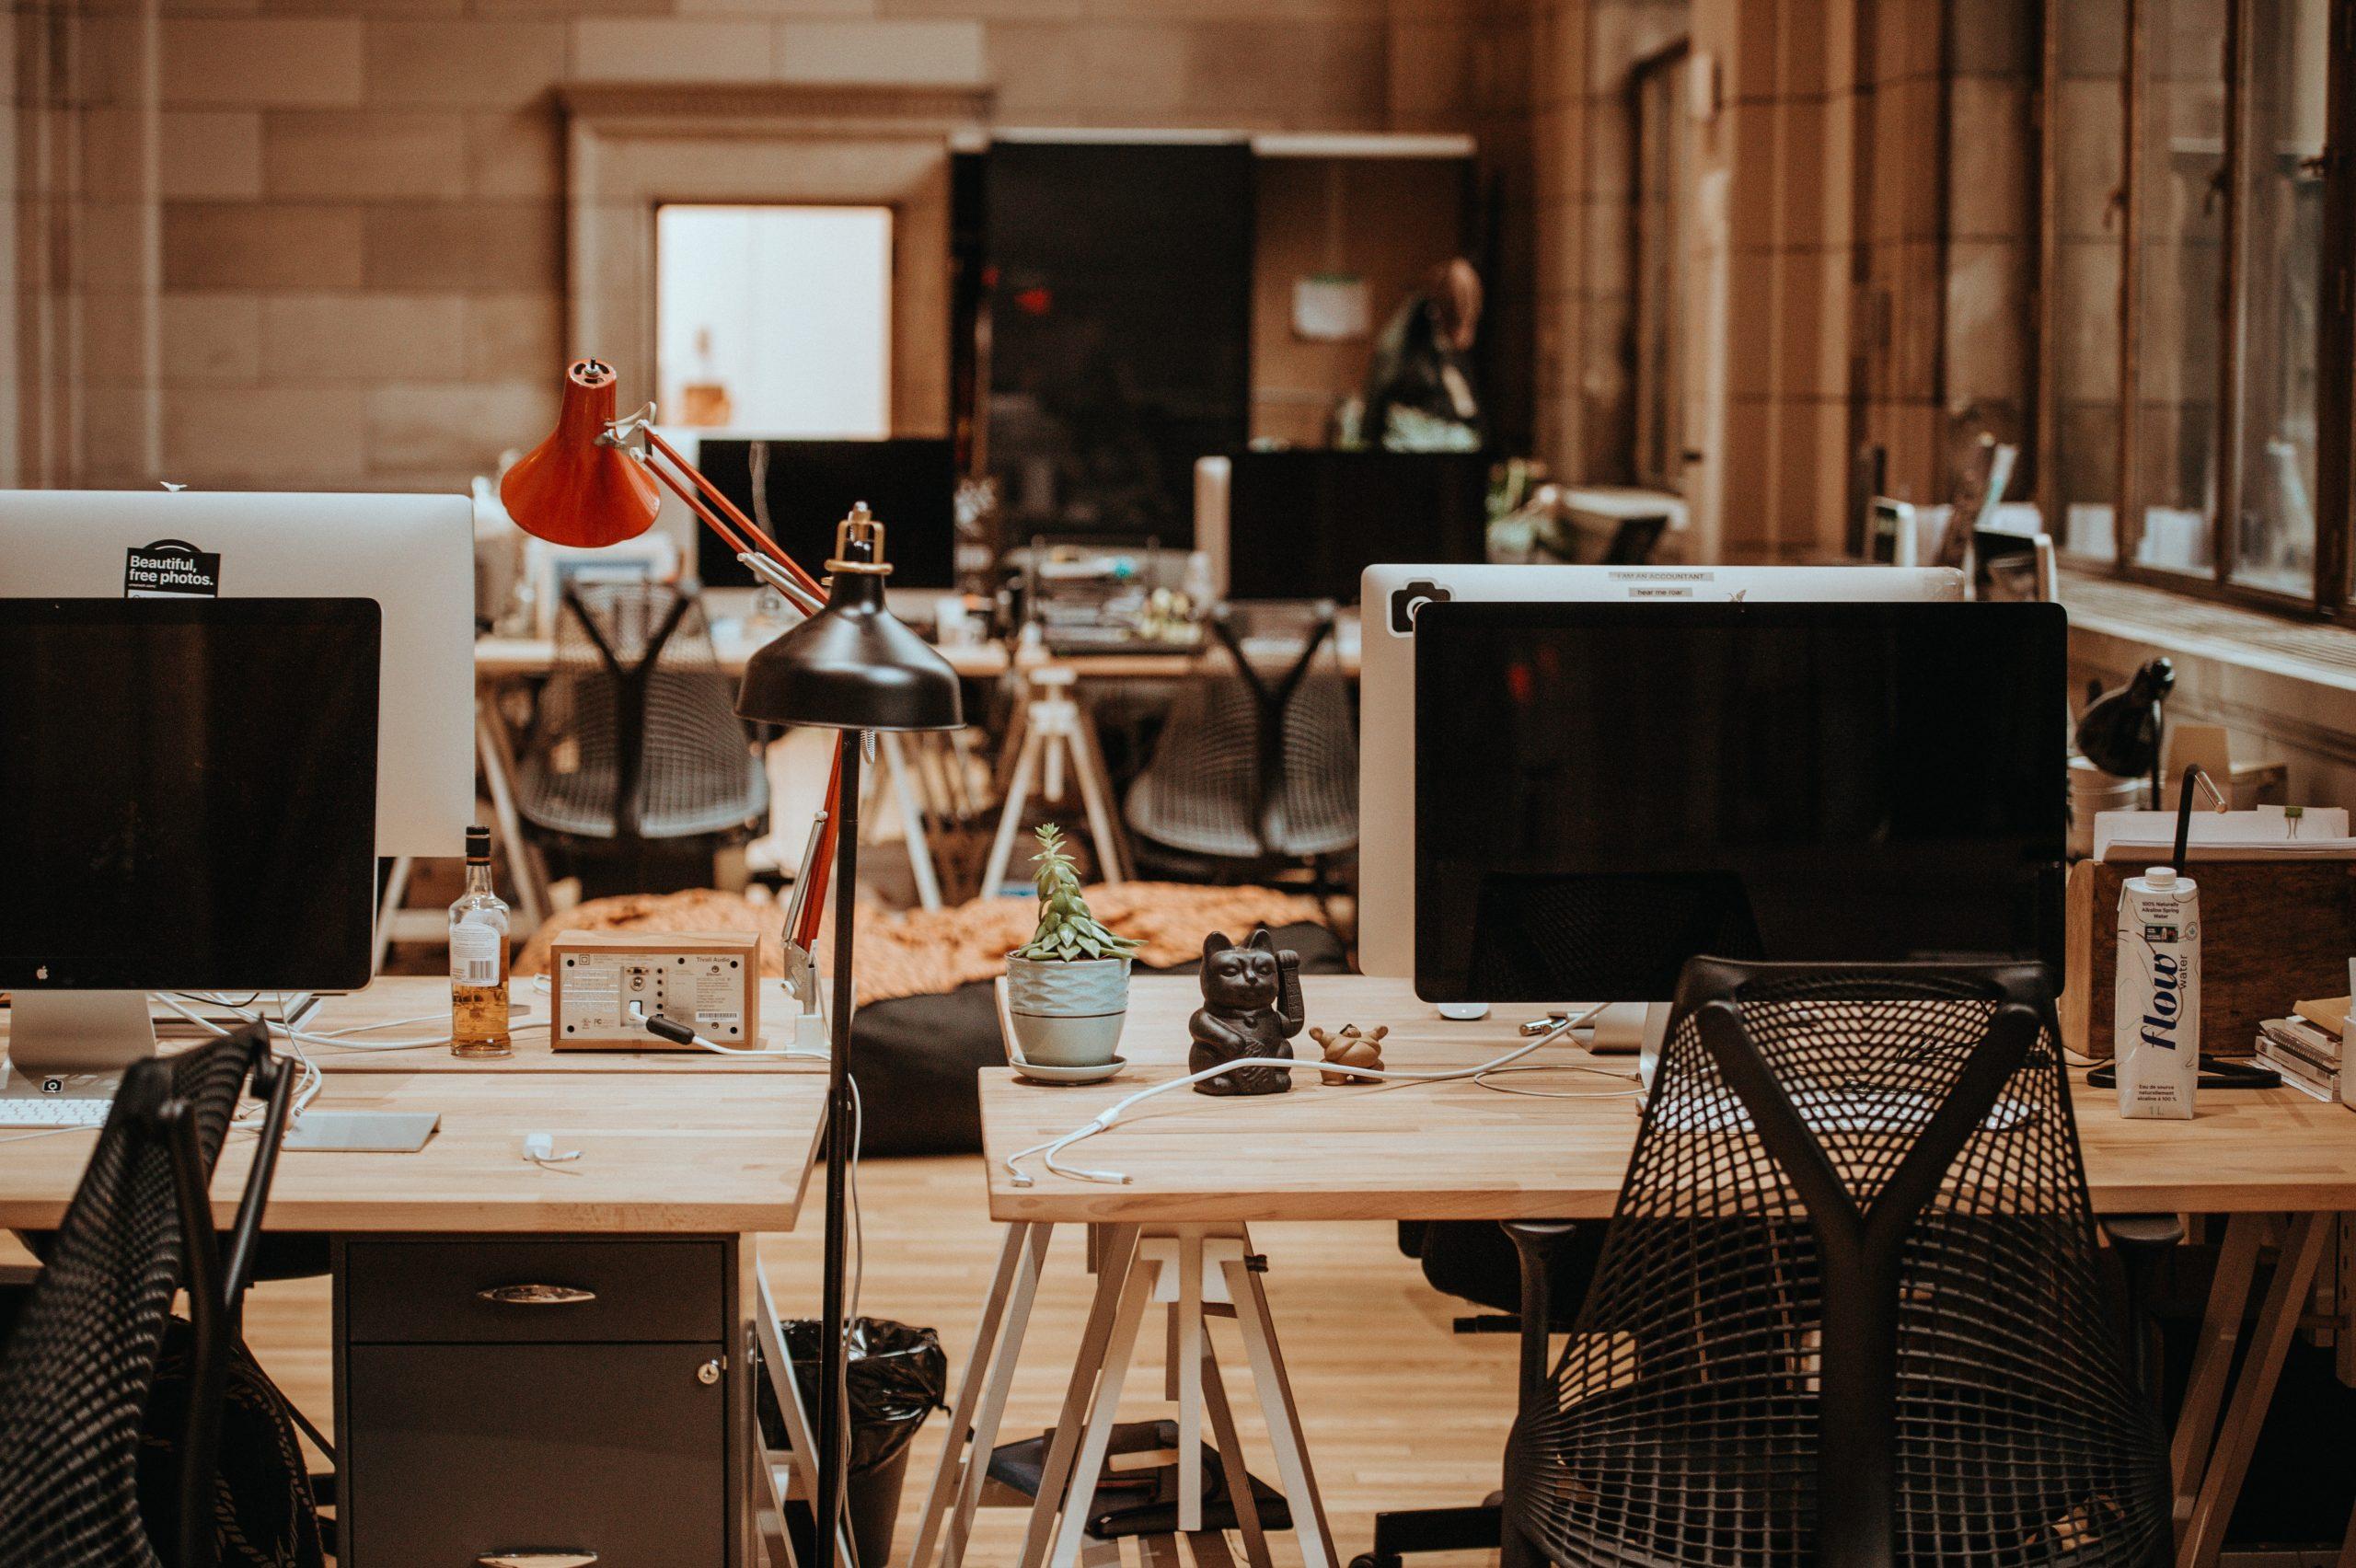 turned off flat screen monitors on top of beige desks